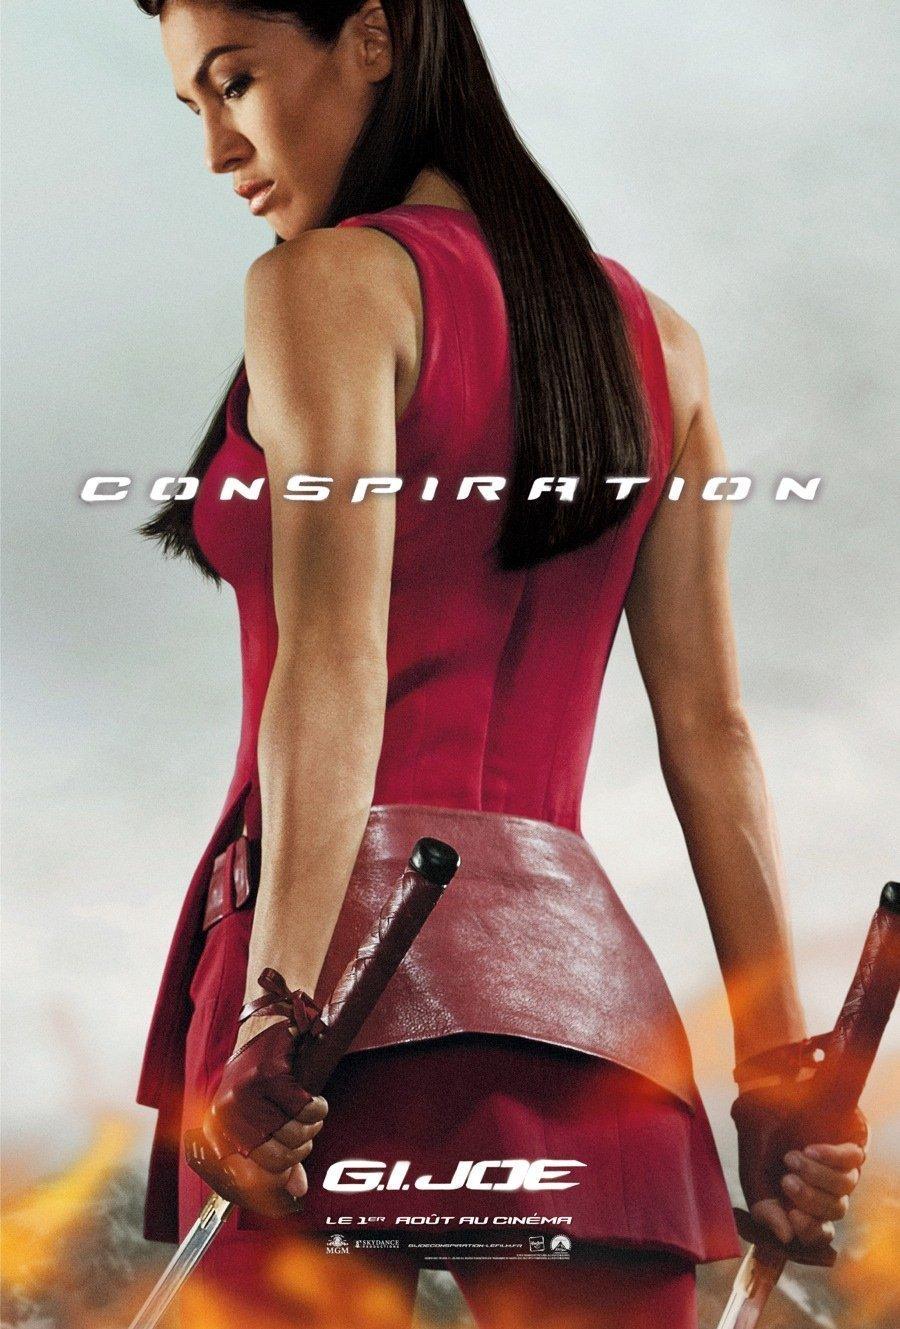 Poster du film G.I. Joe : Conspiration avec Jinx (Elodie Yung)